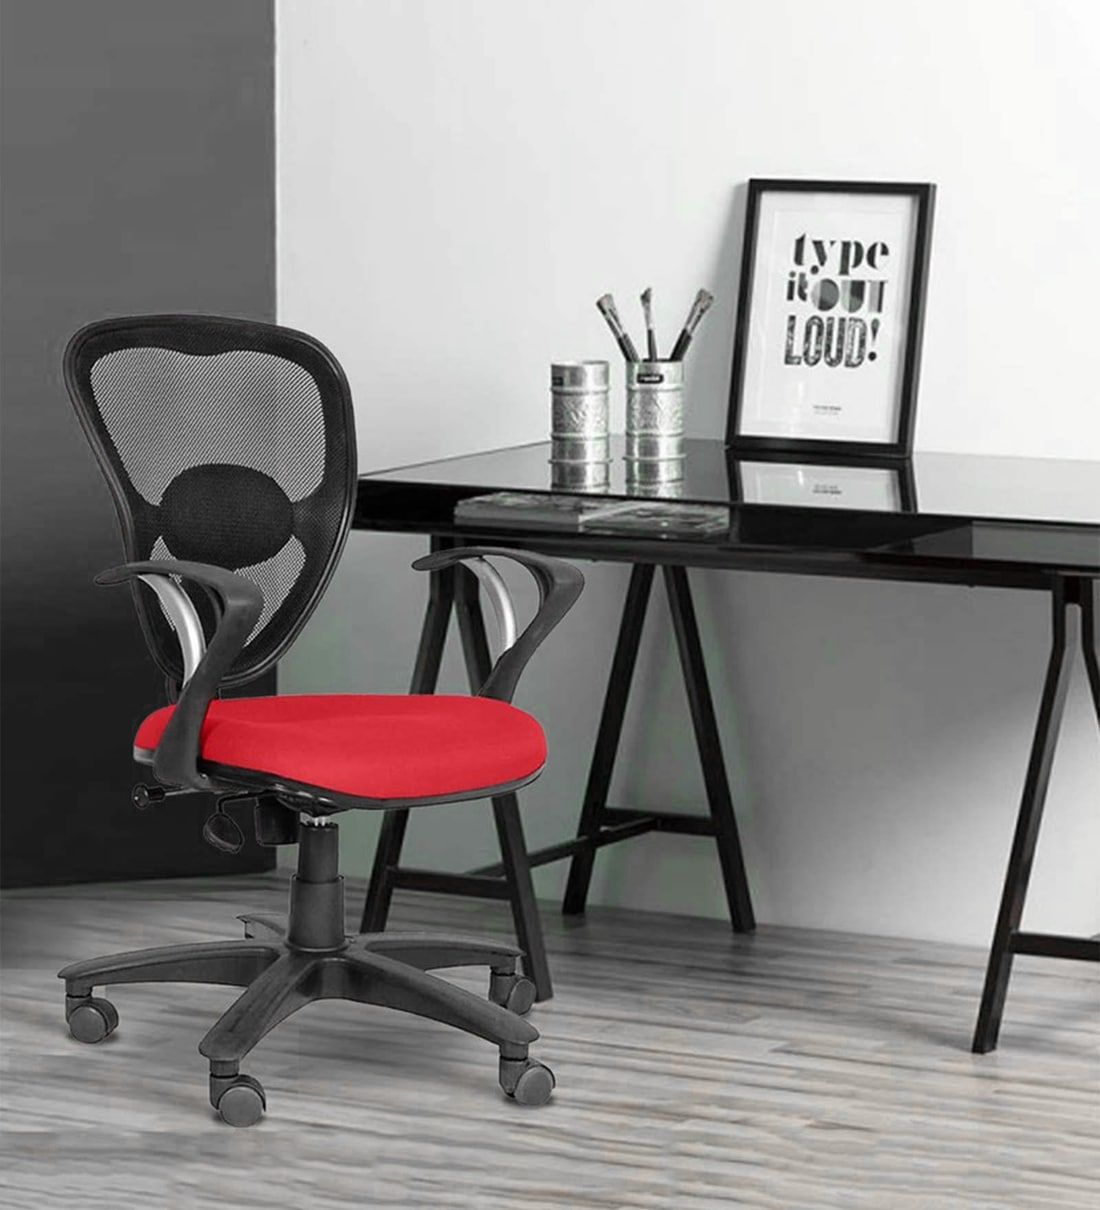 Buy Triangular Ergonomic Chair in Black & Blue Colour by